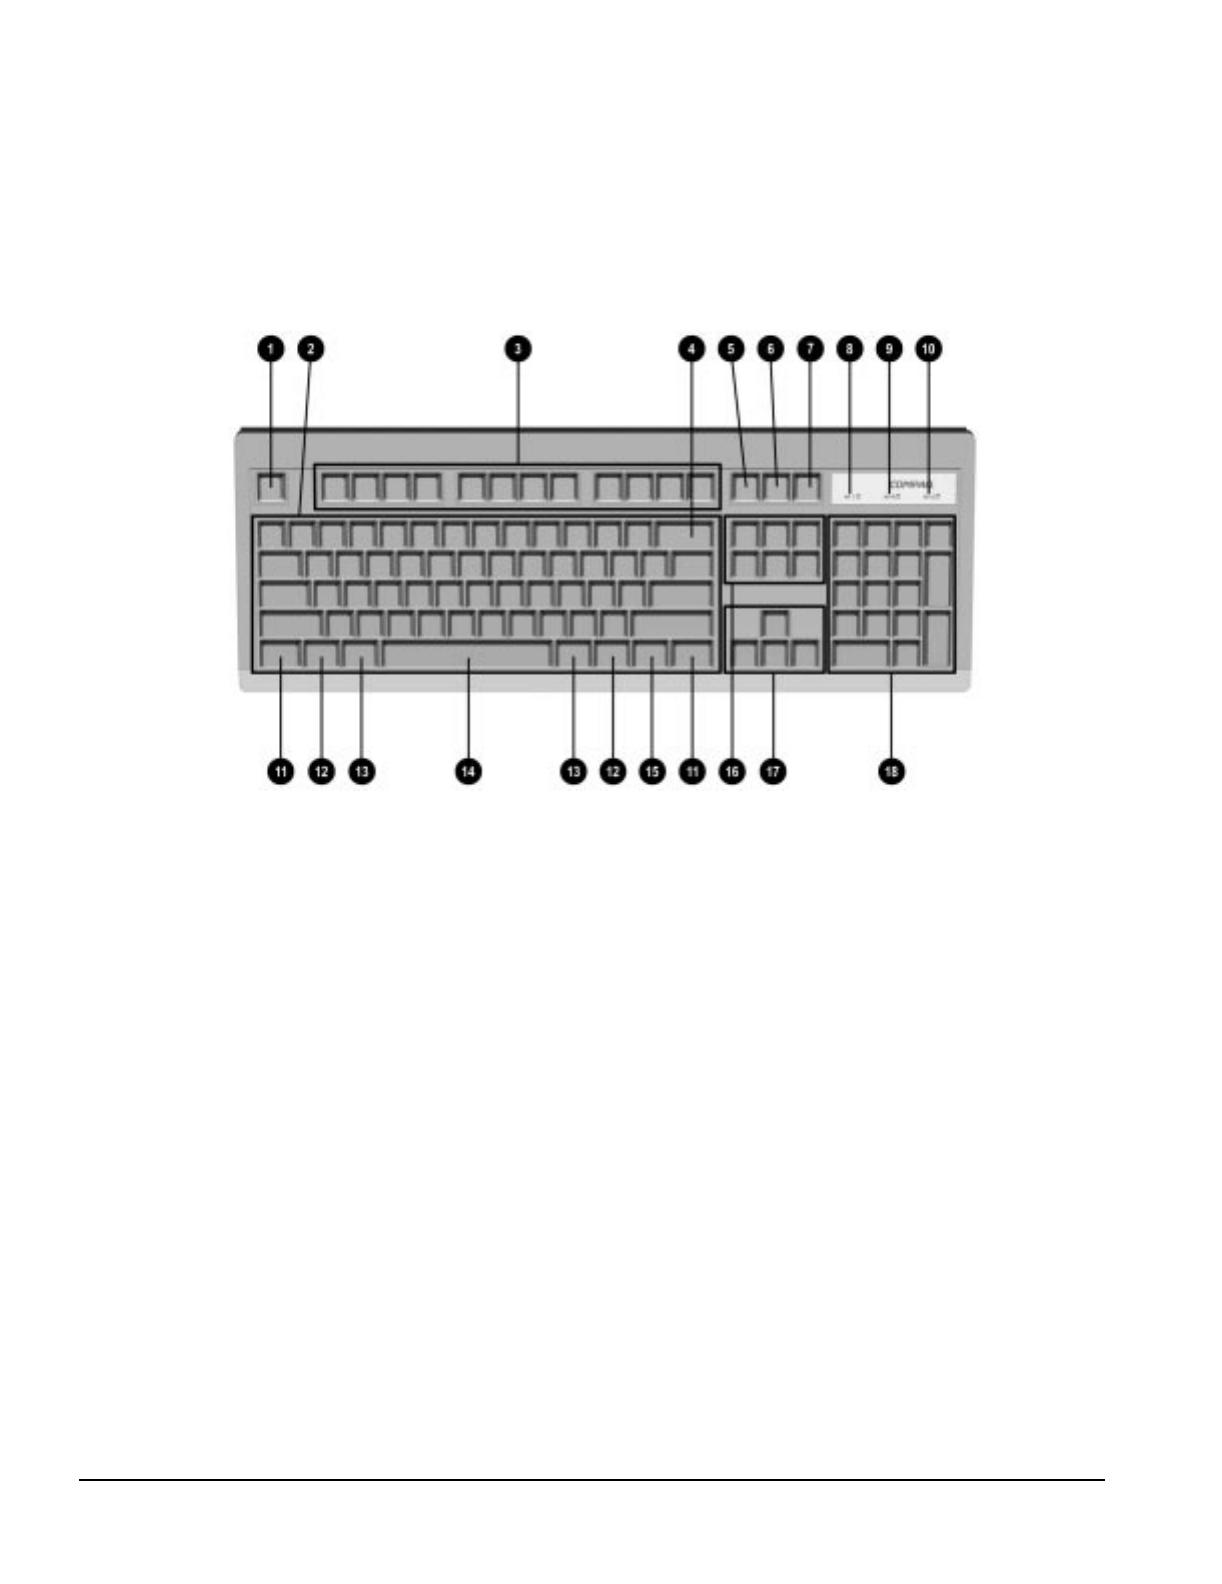 Compaq Deskpro 2000 Users Manual Maintenance & Service Guide